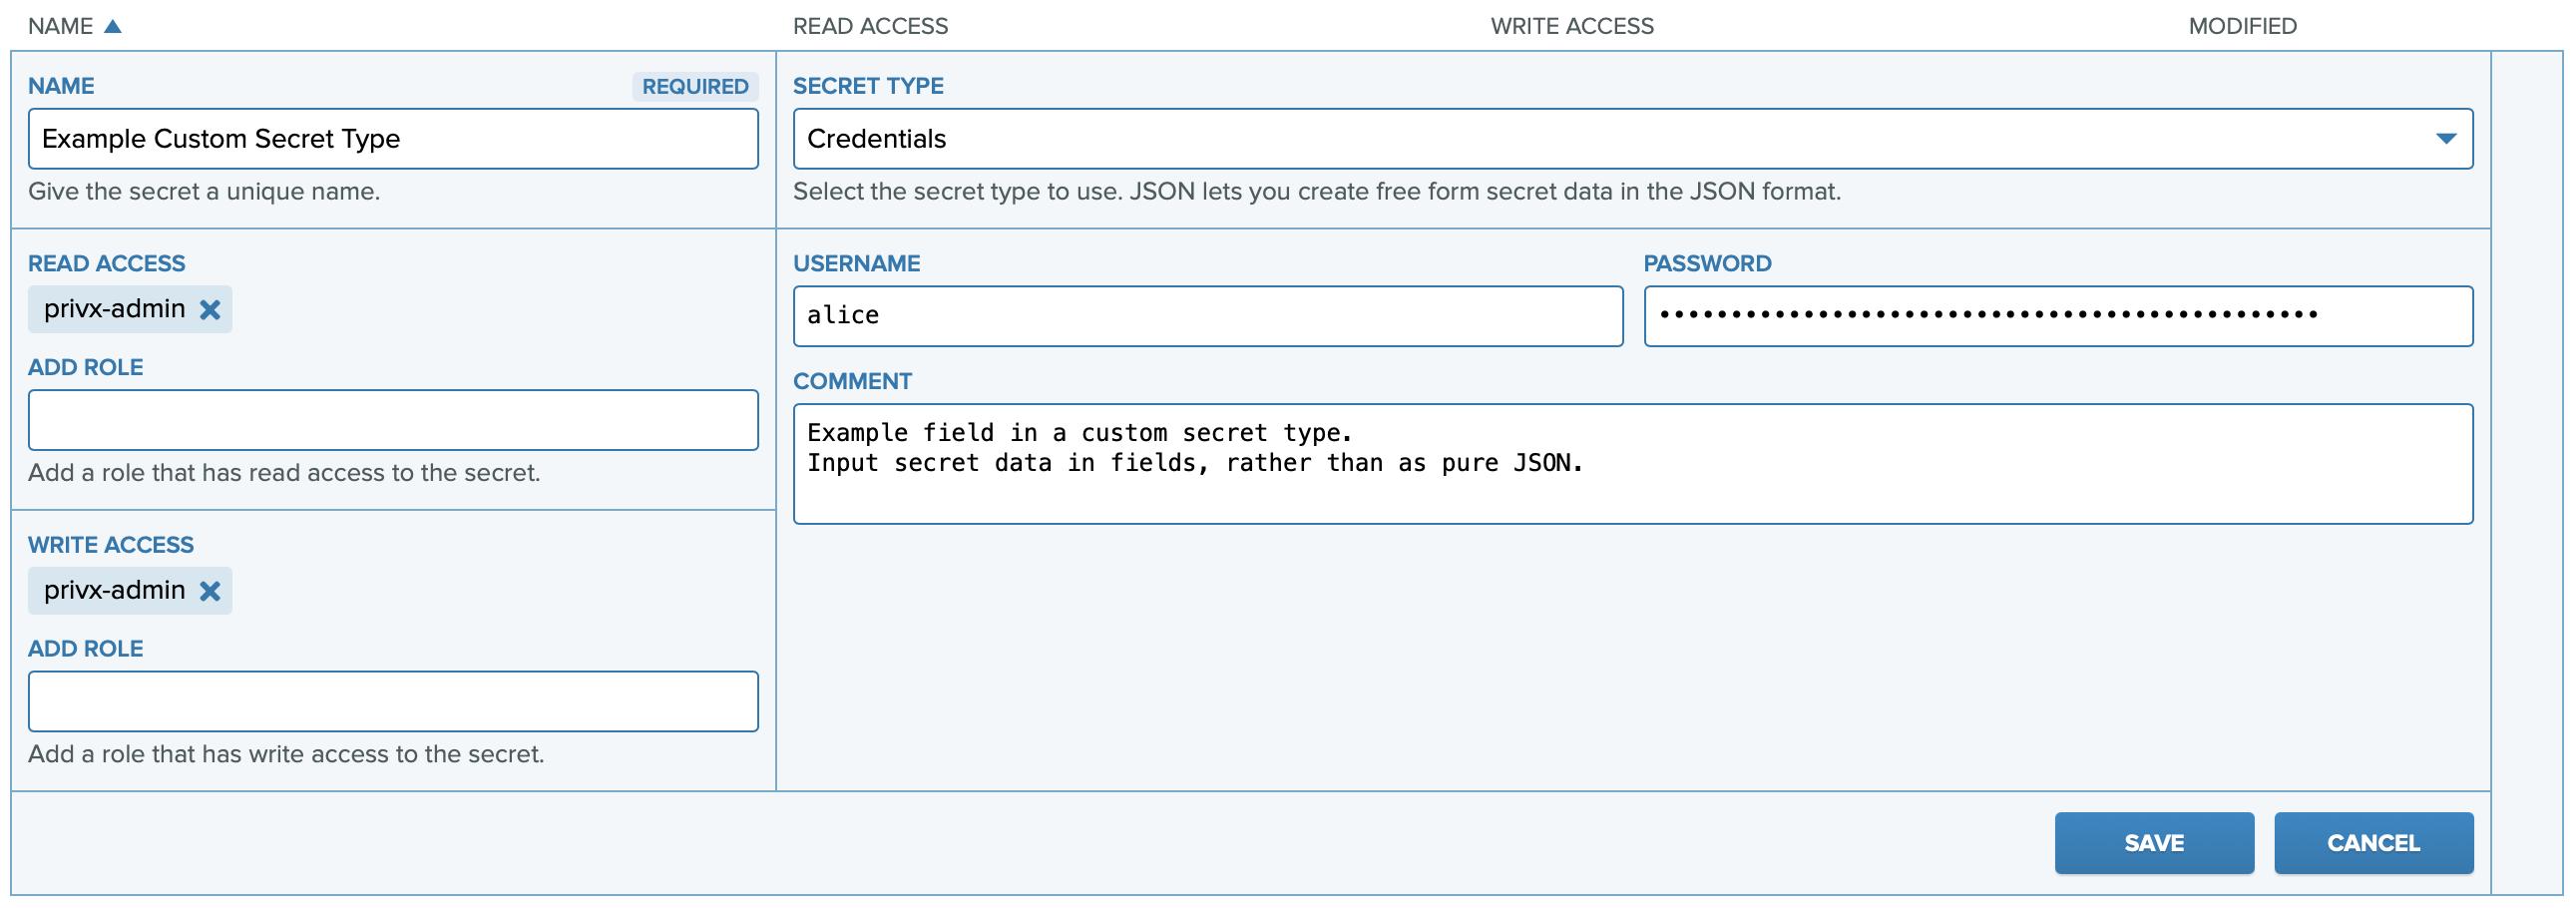 Custom secret types provide a form for providing secret data.